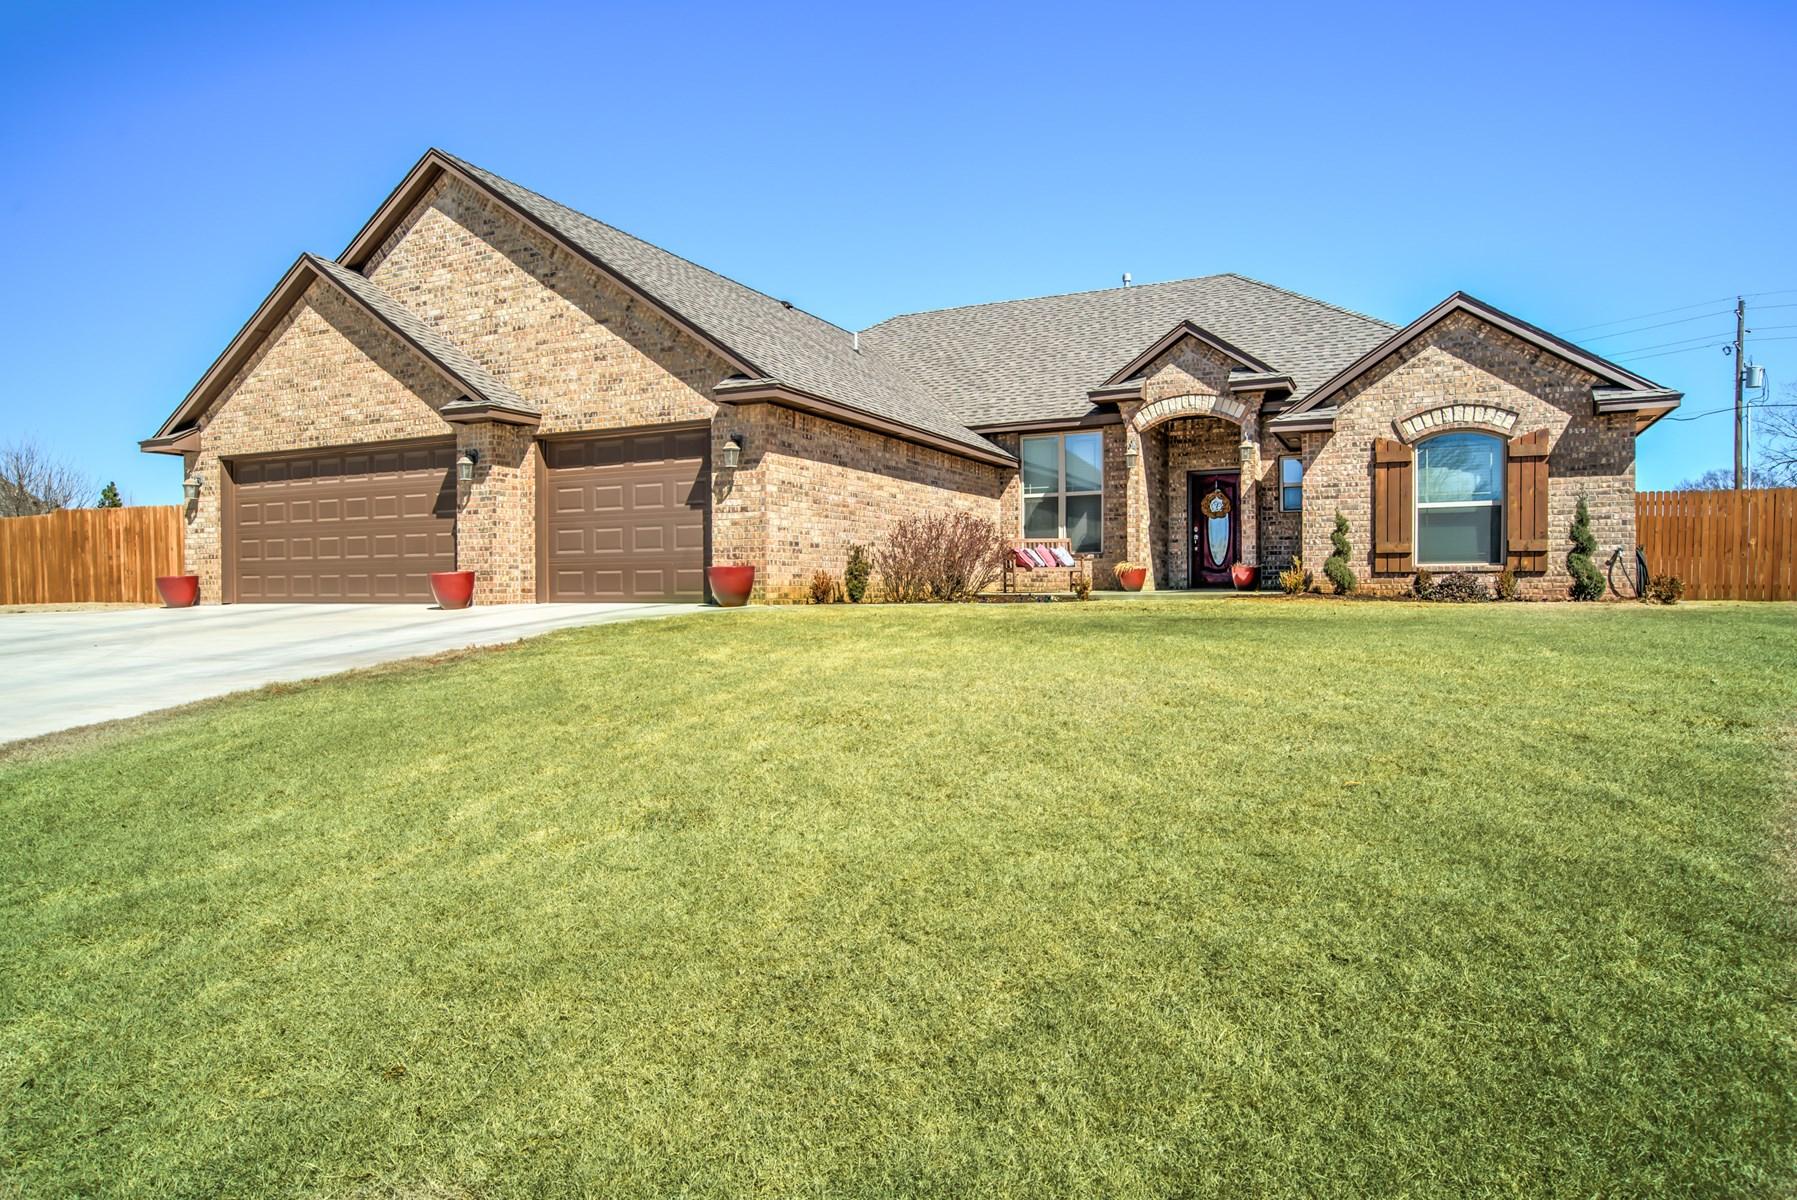 Clinton, OK Home for Sale, Custer County, 73601